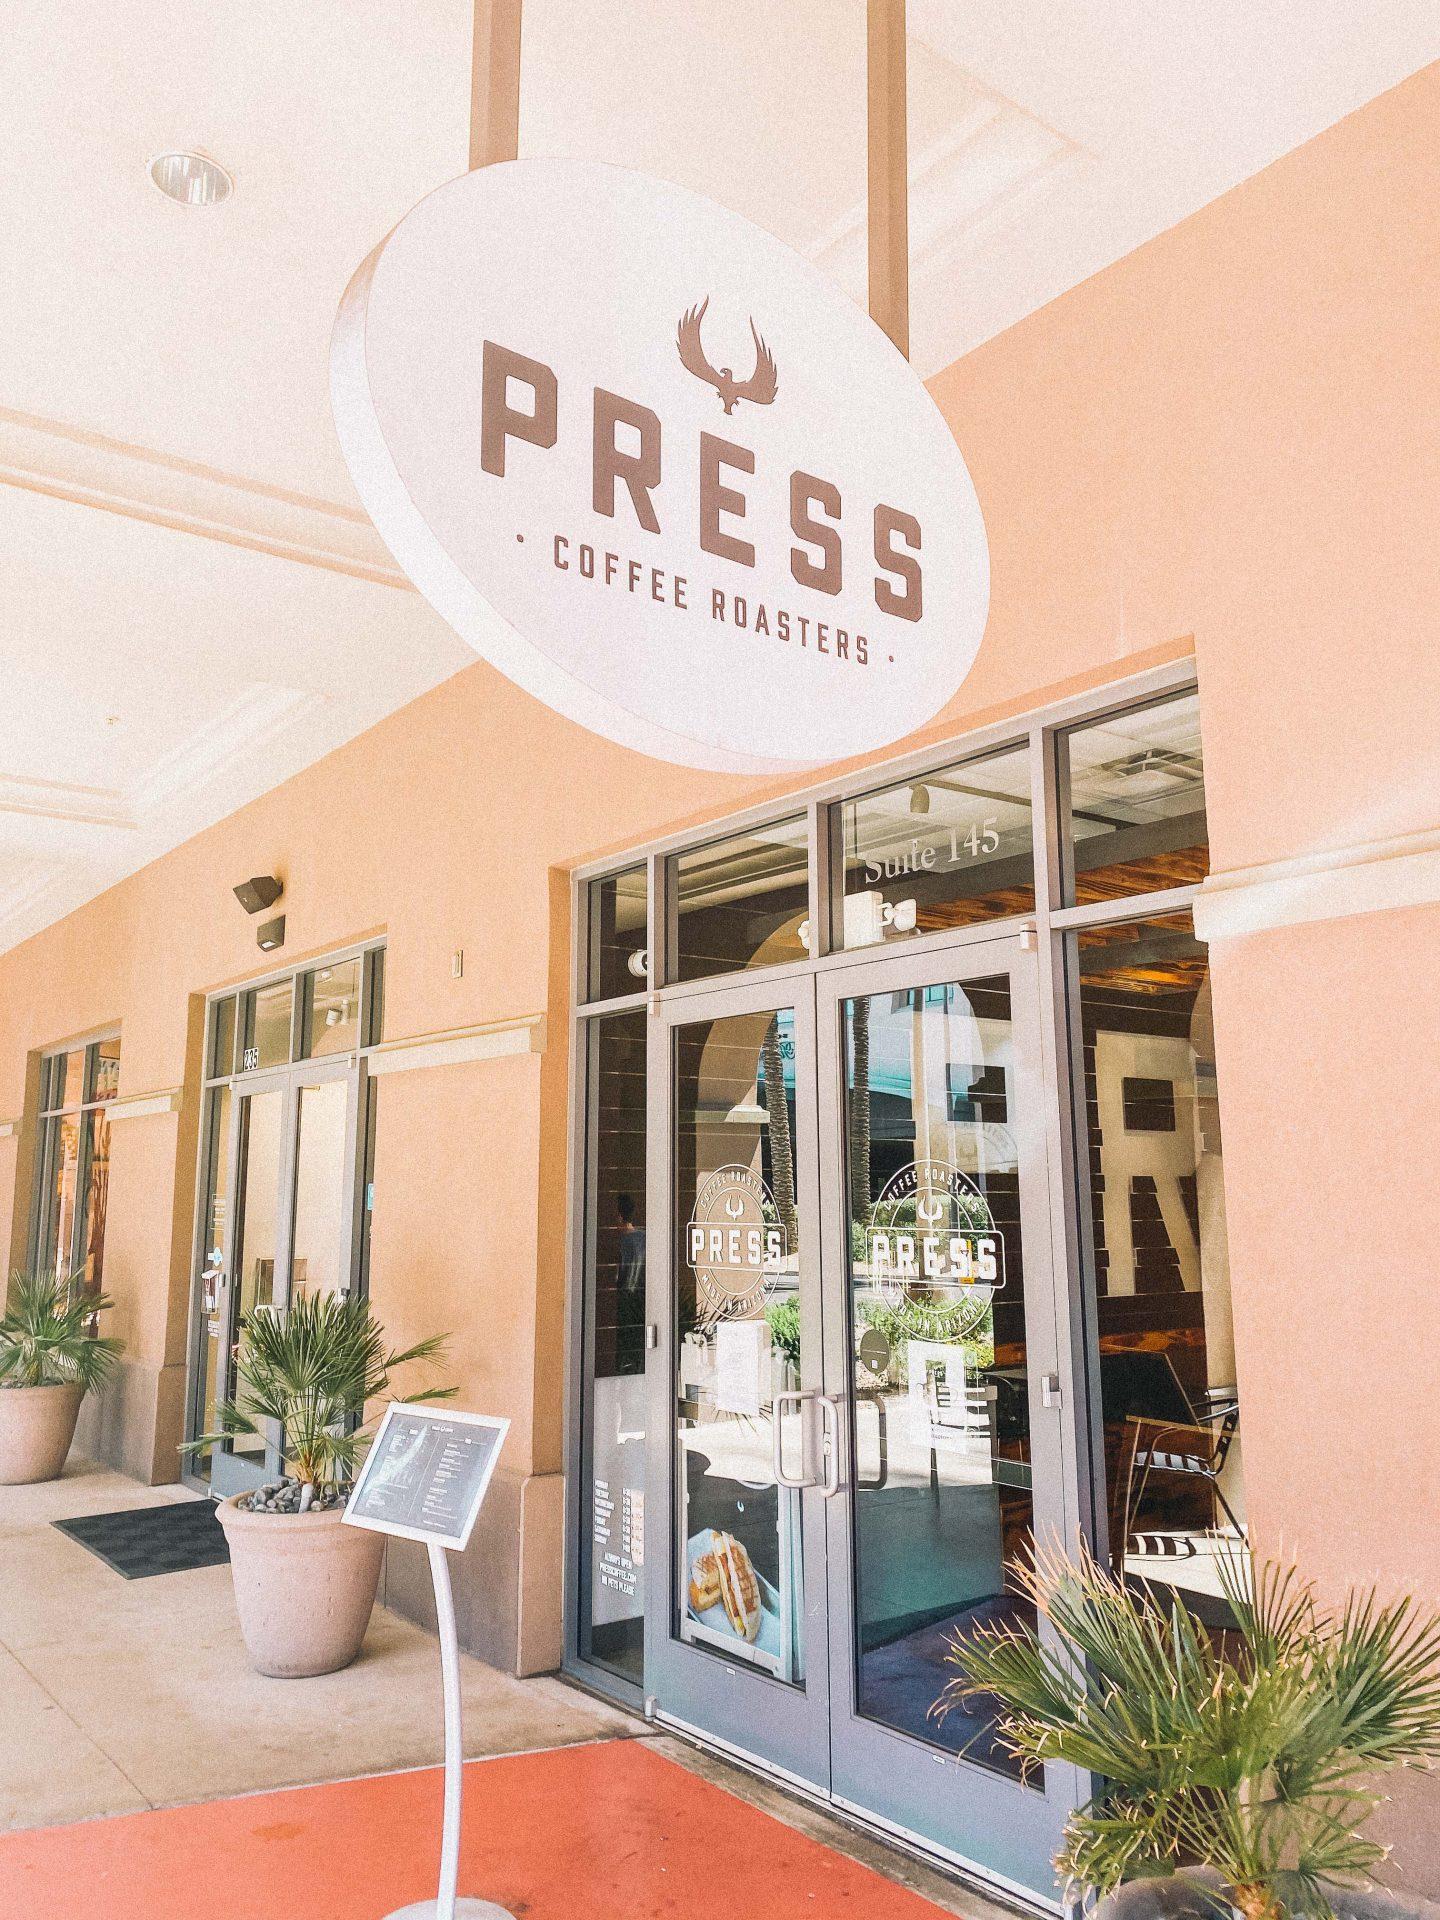 press coffee, scottsdale coffee shops, scottsdale arizona cafe